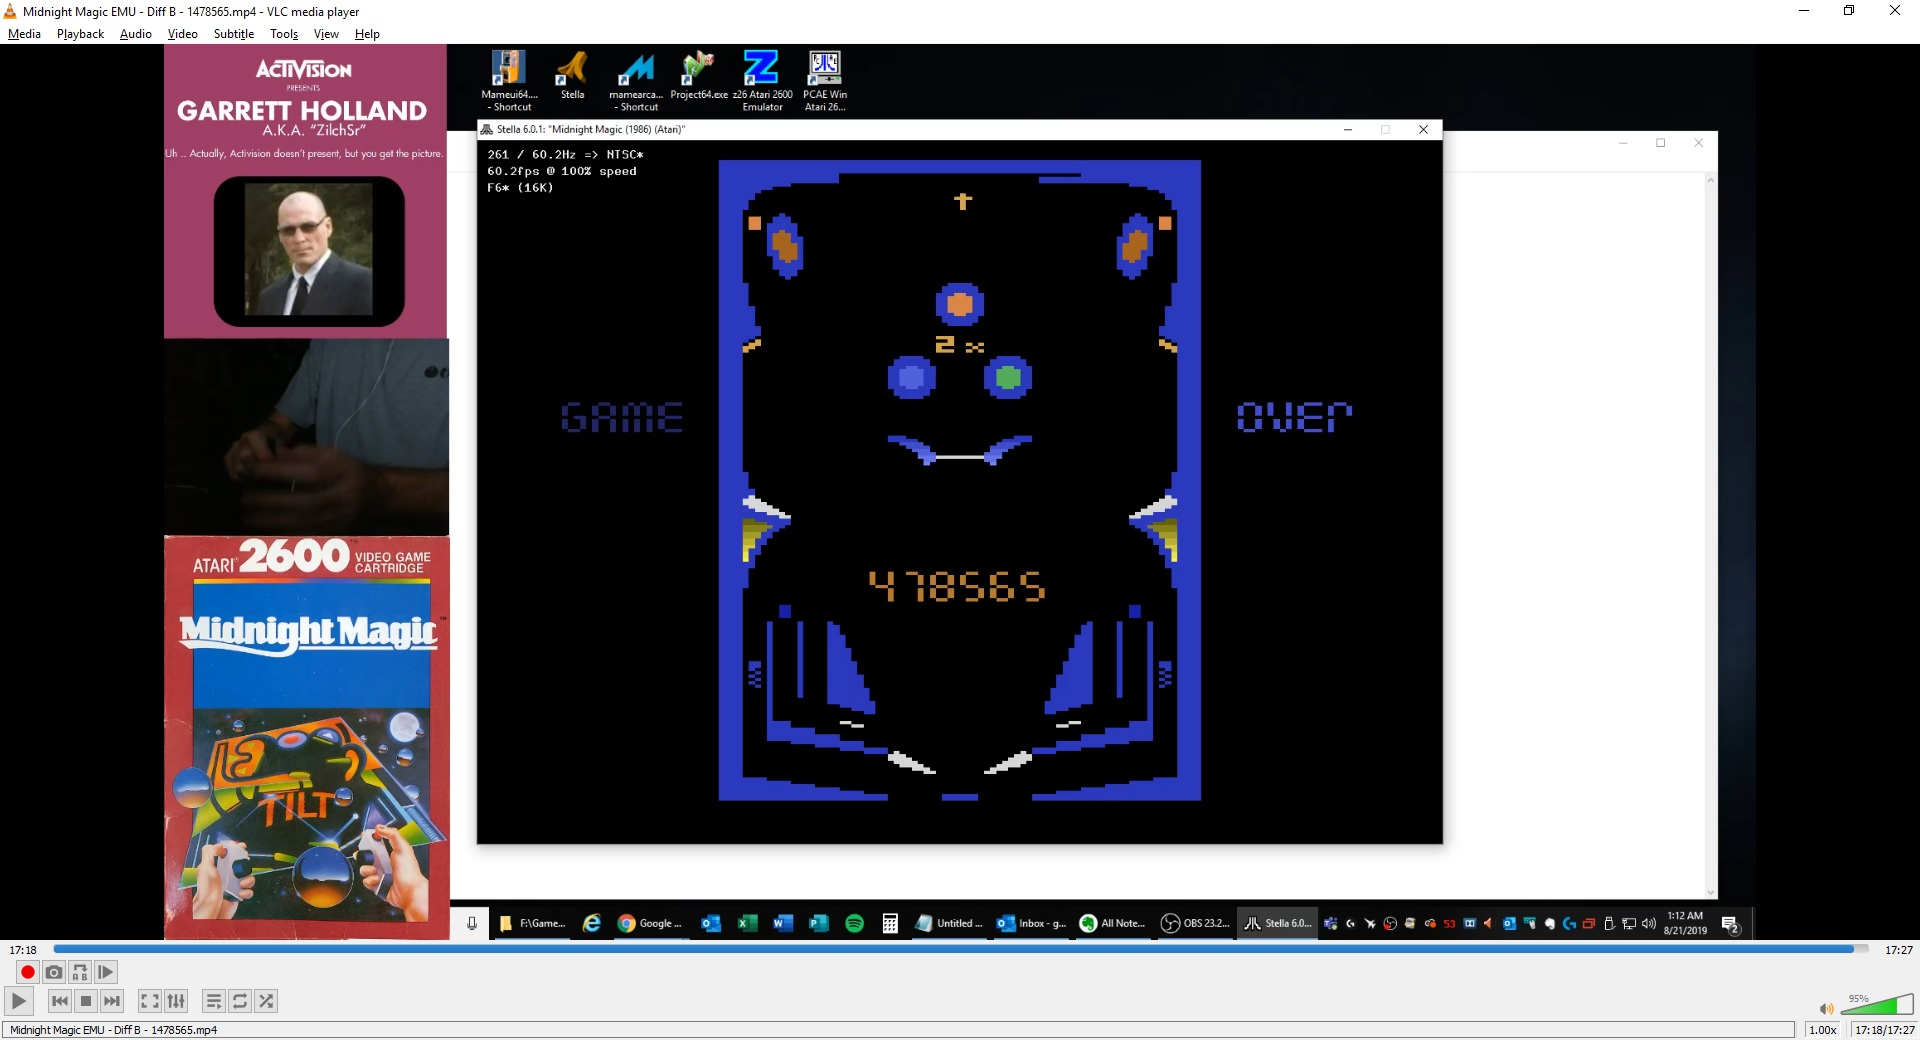 ZilchSr: Midnight Magic (Atari 2600 Emulated Novice/B Mode) 1,478,565 points on 2019-08-21 00:34:26